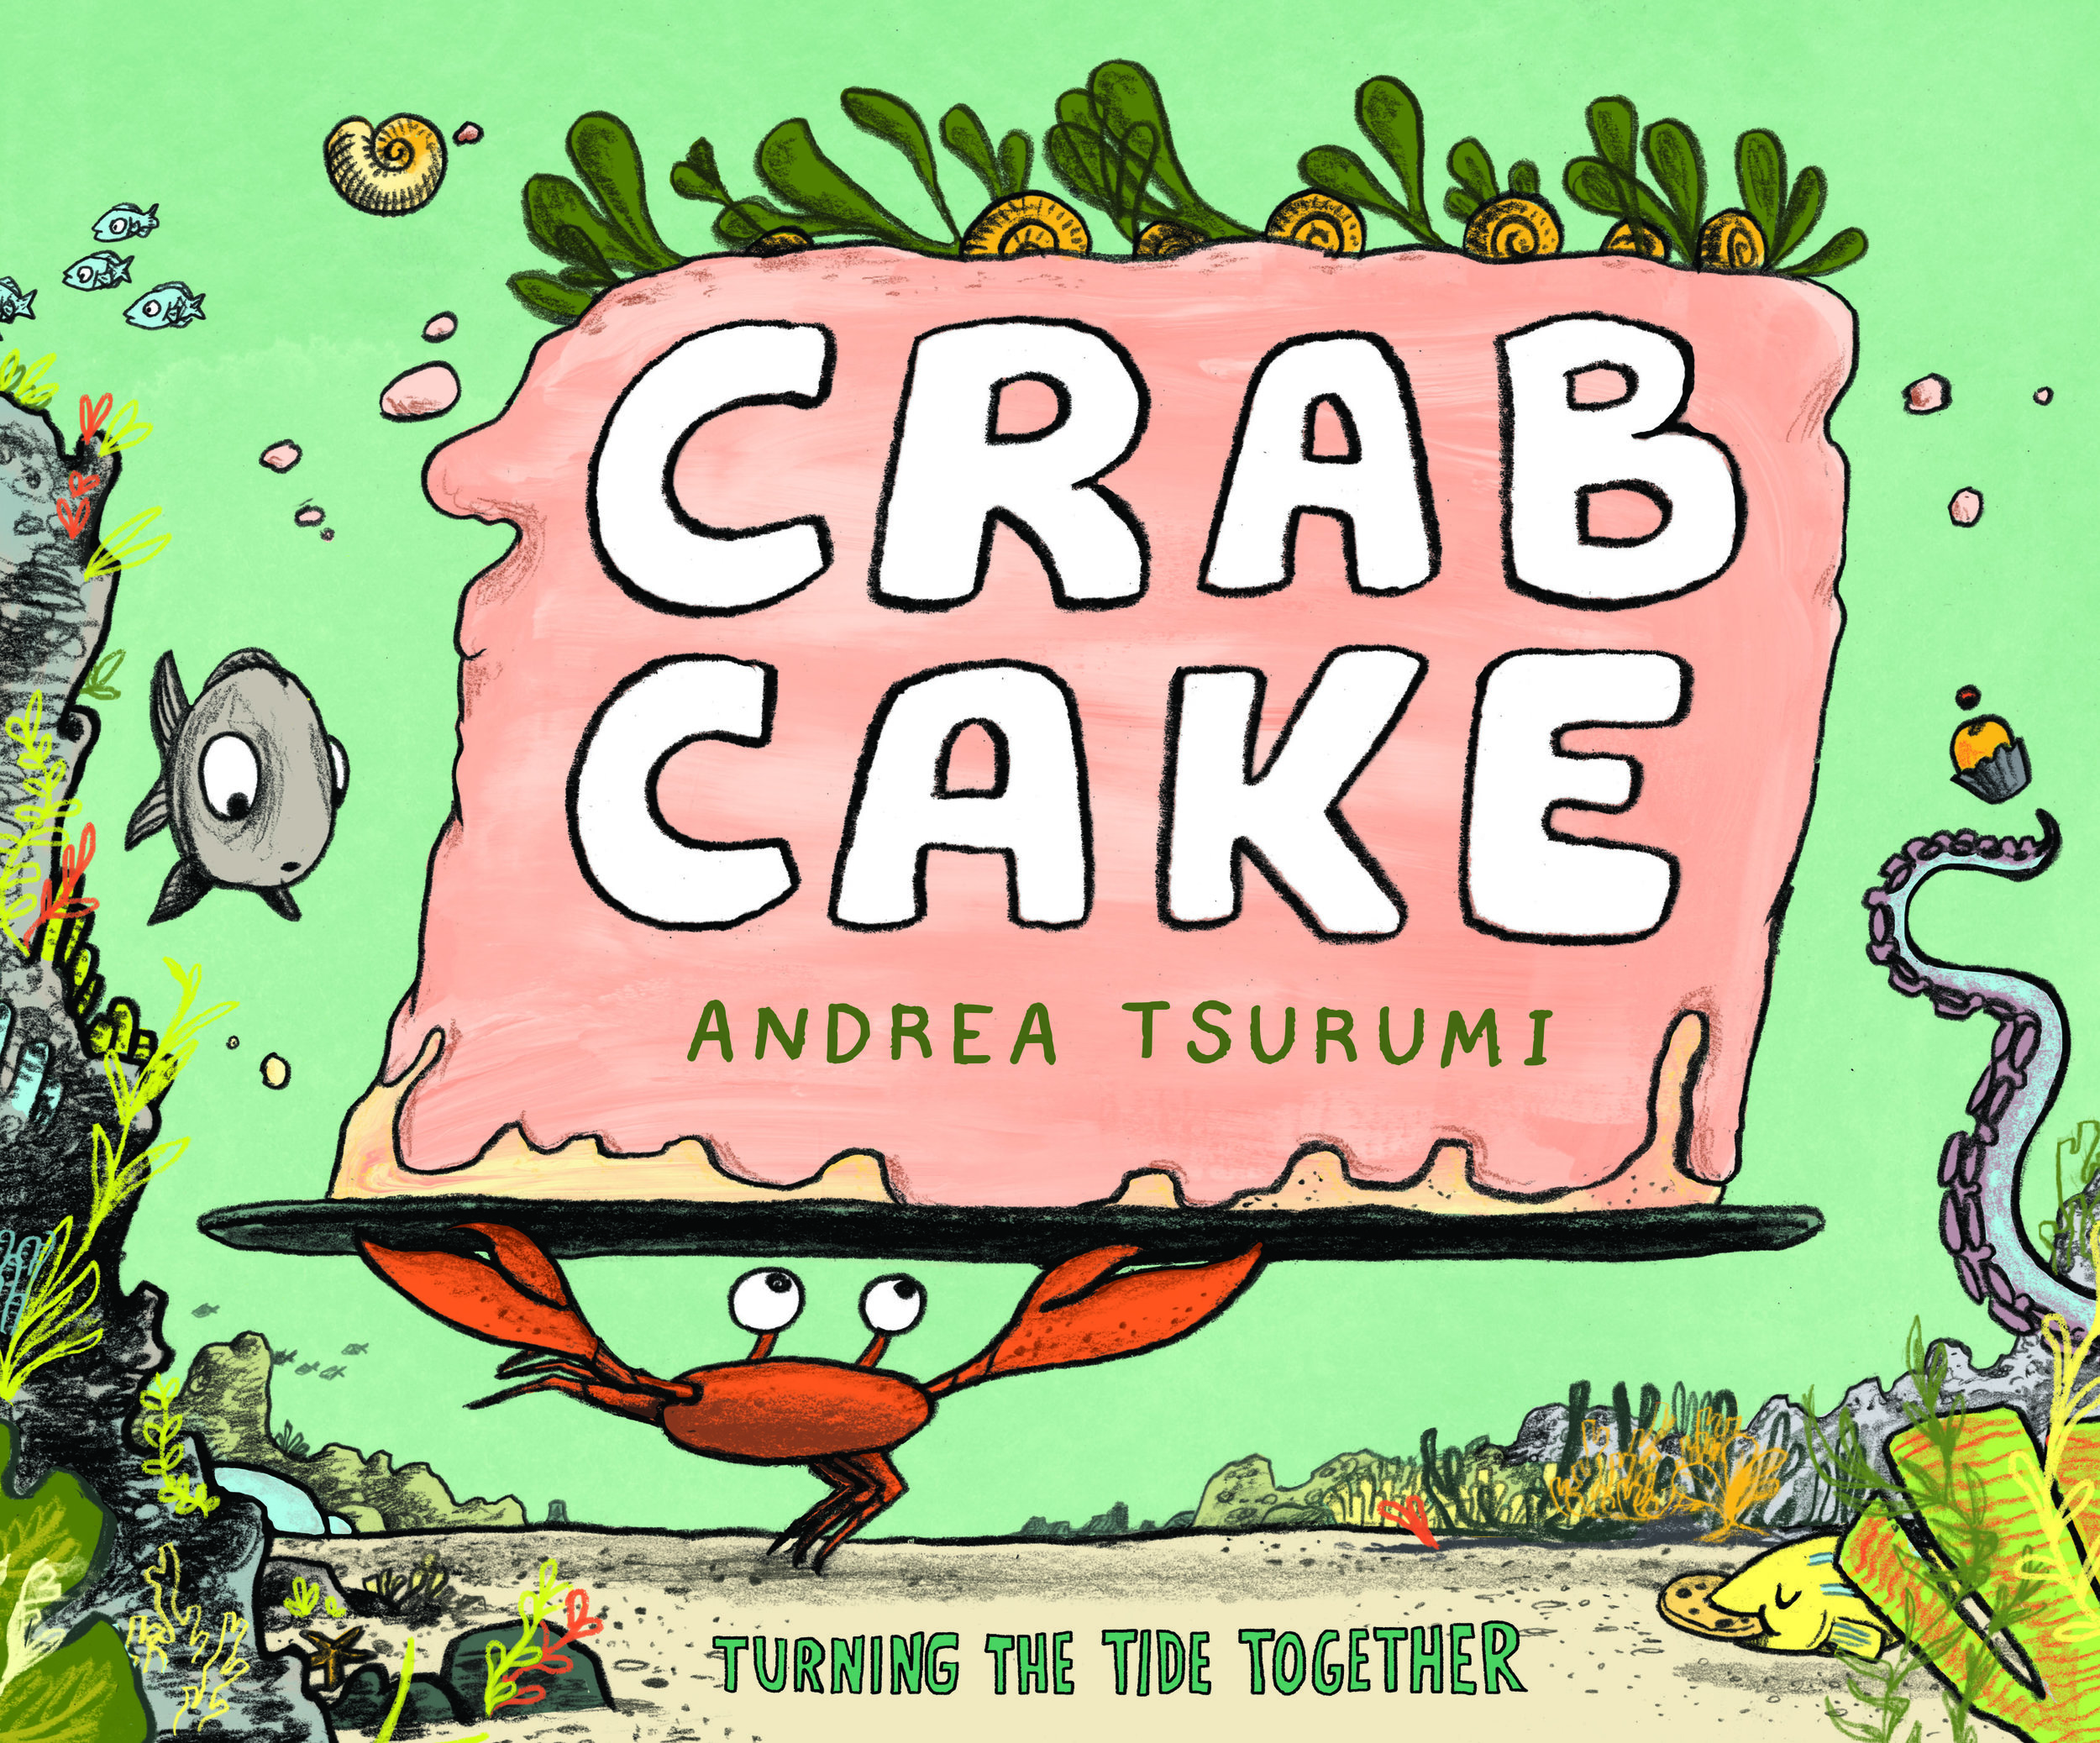 crabcake_tsurumi_highrescover.jpg